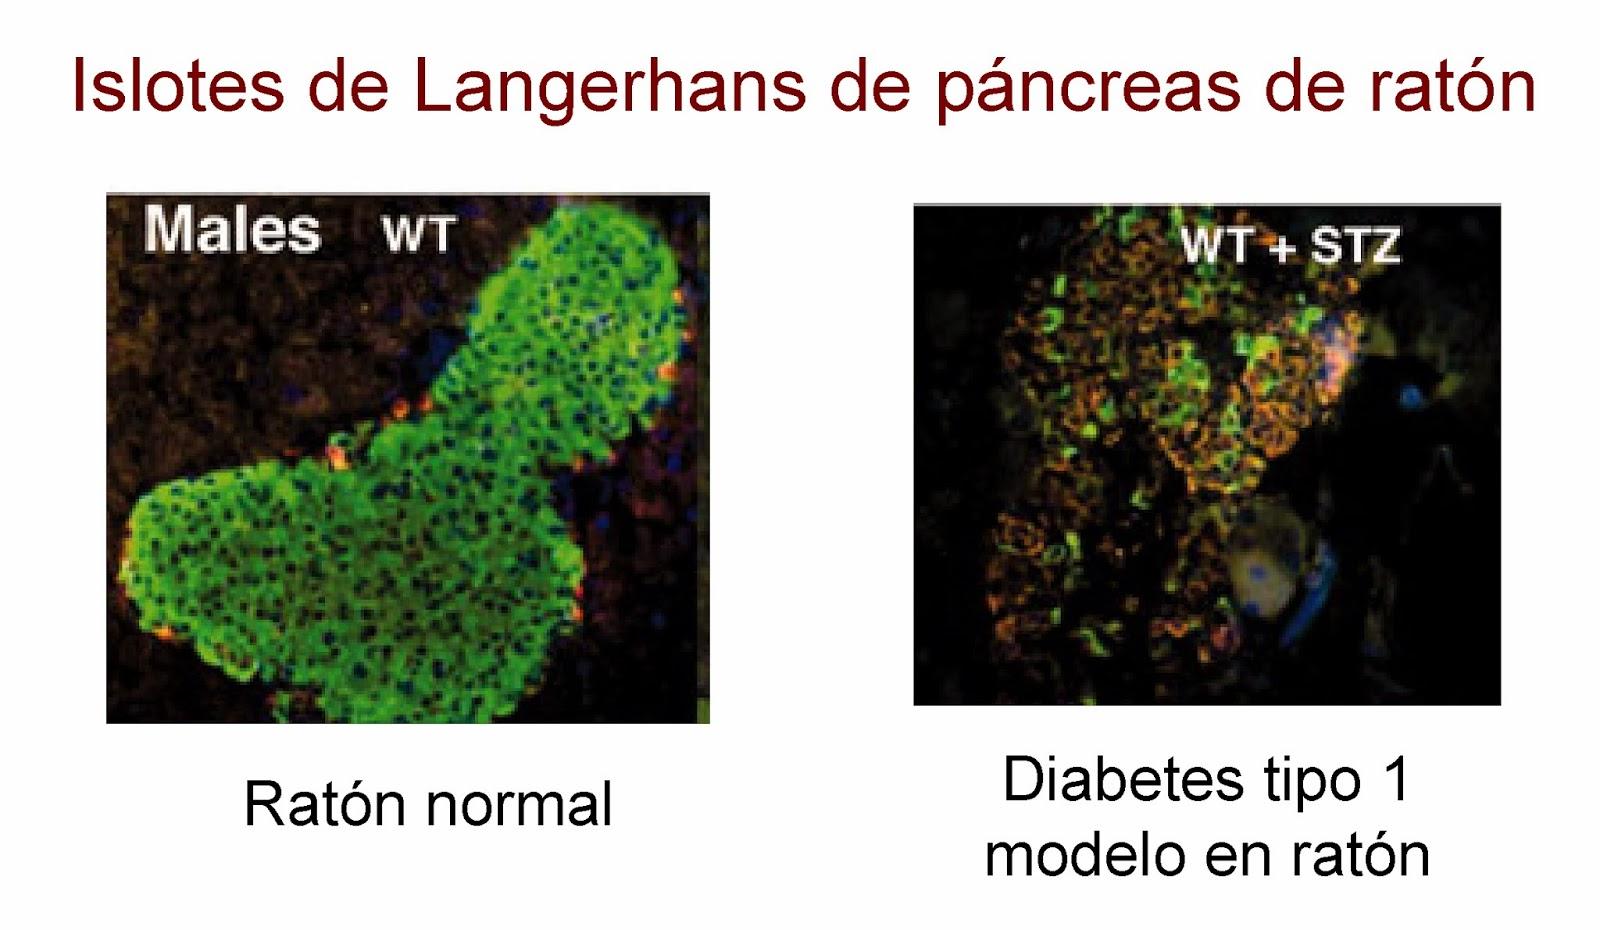 Islote de Langerhans de un ratón con diabetes tipo 1